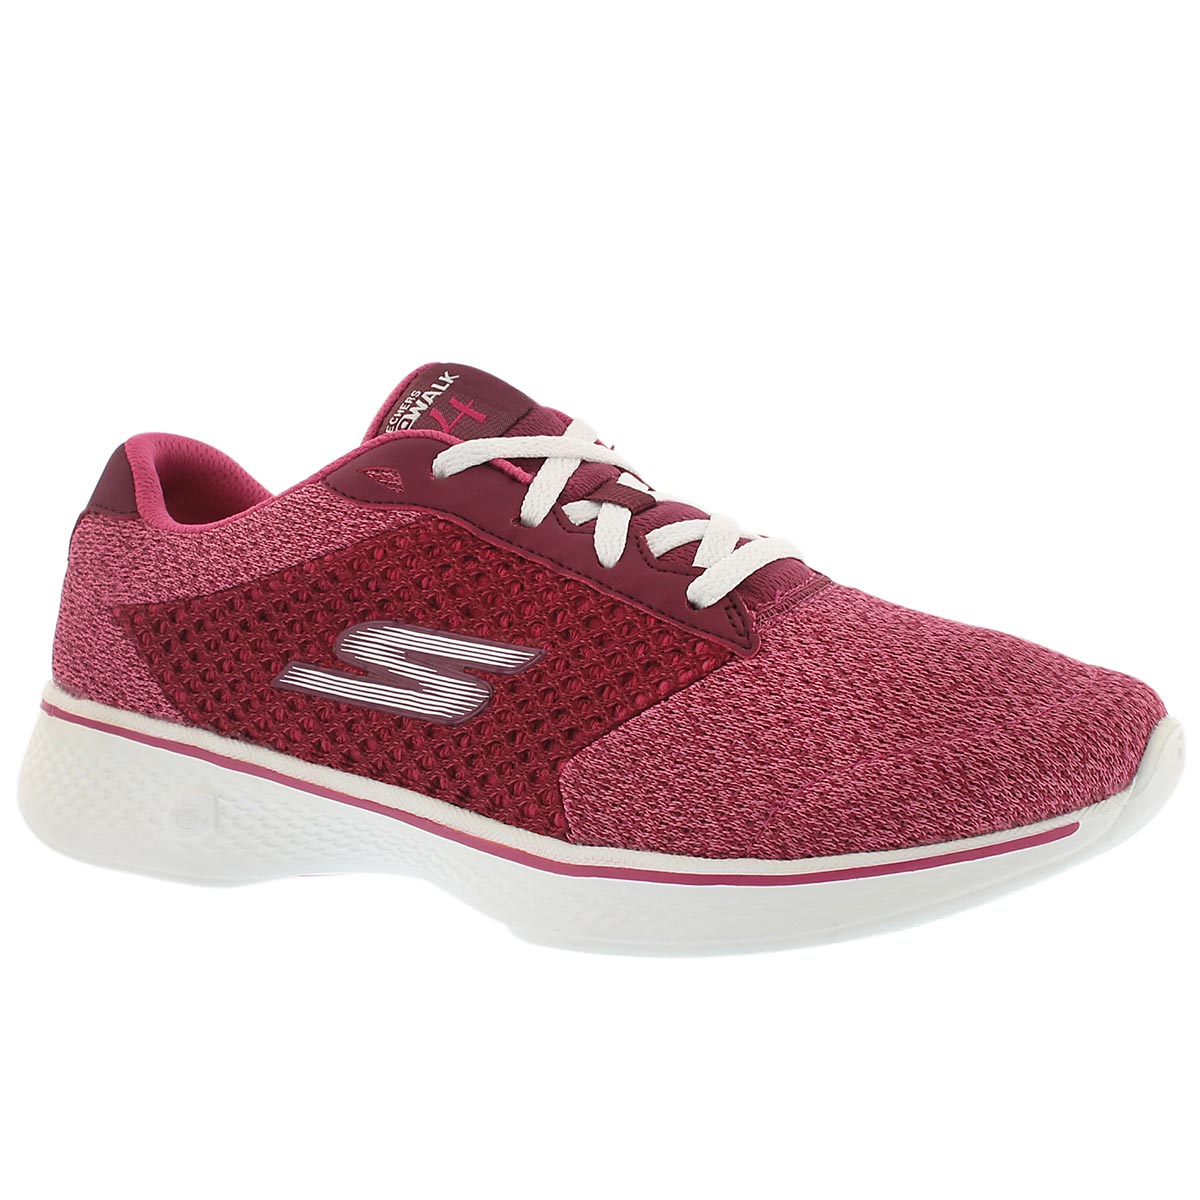 Lds GO Walk 4 rasp lace up walking shoe